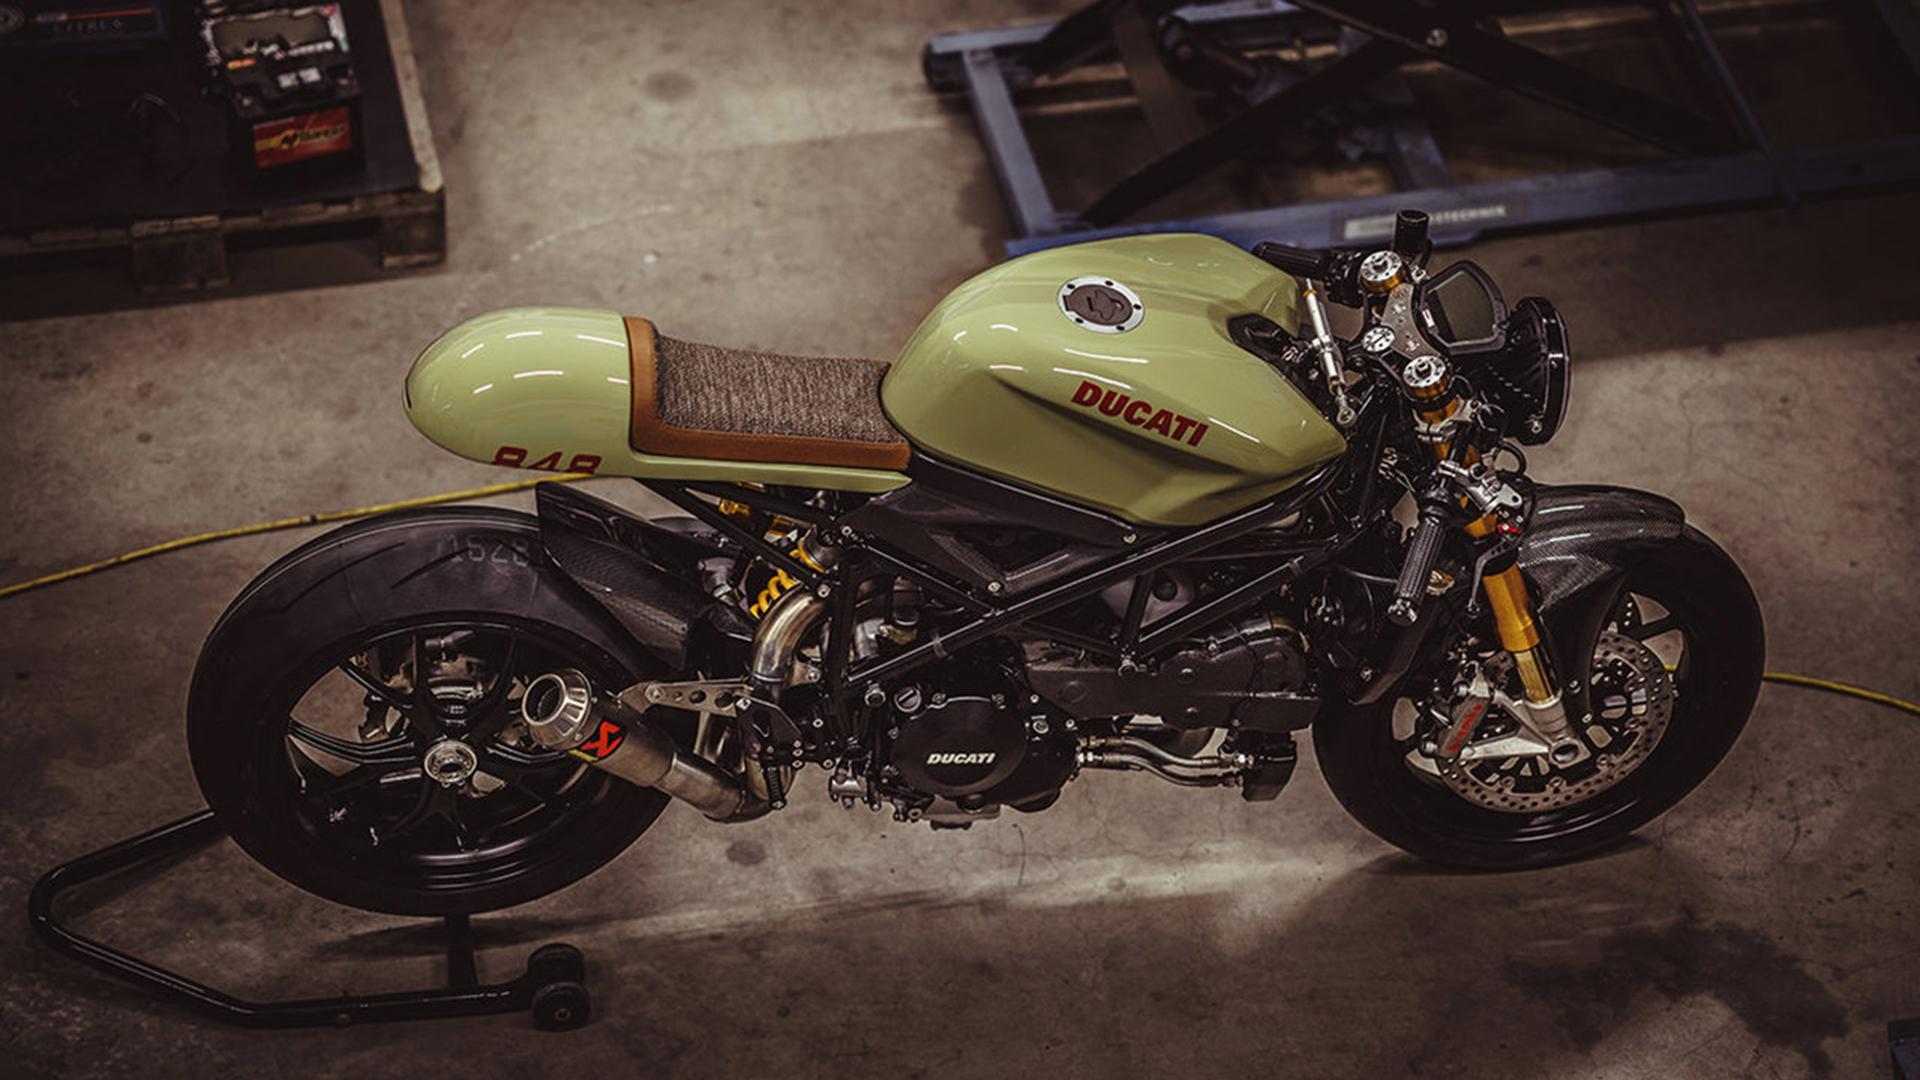 ducati-848-evo-by-nct-moto